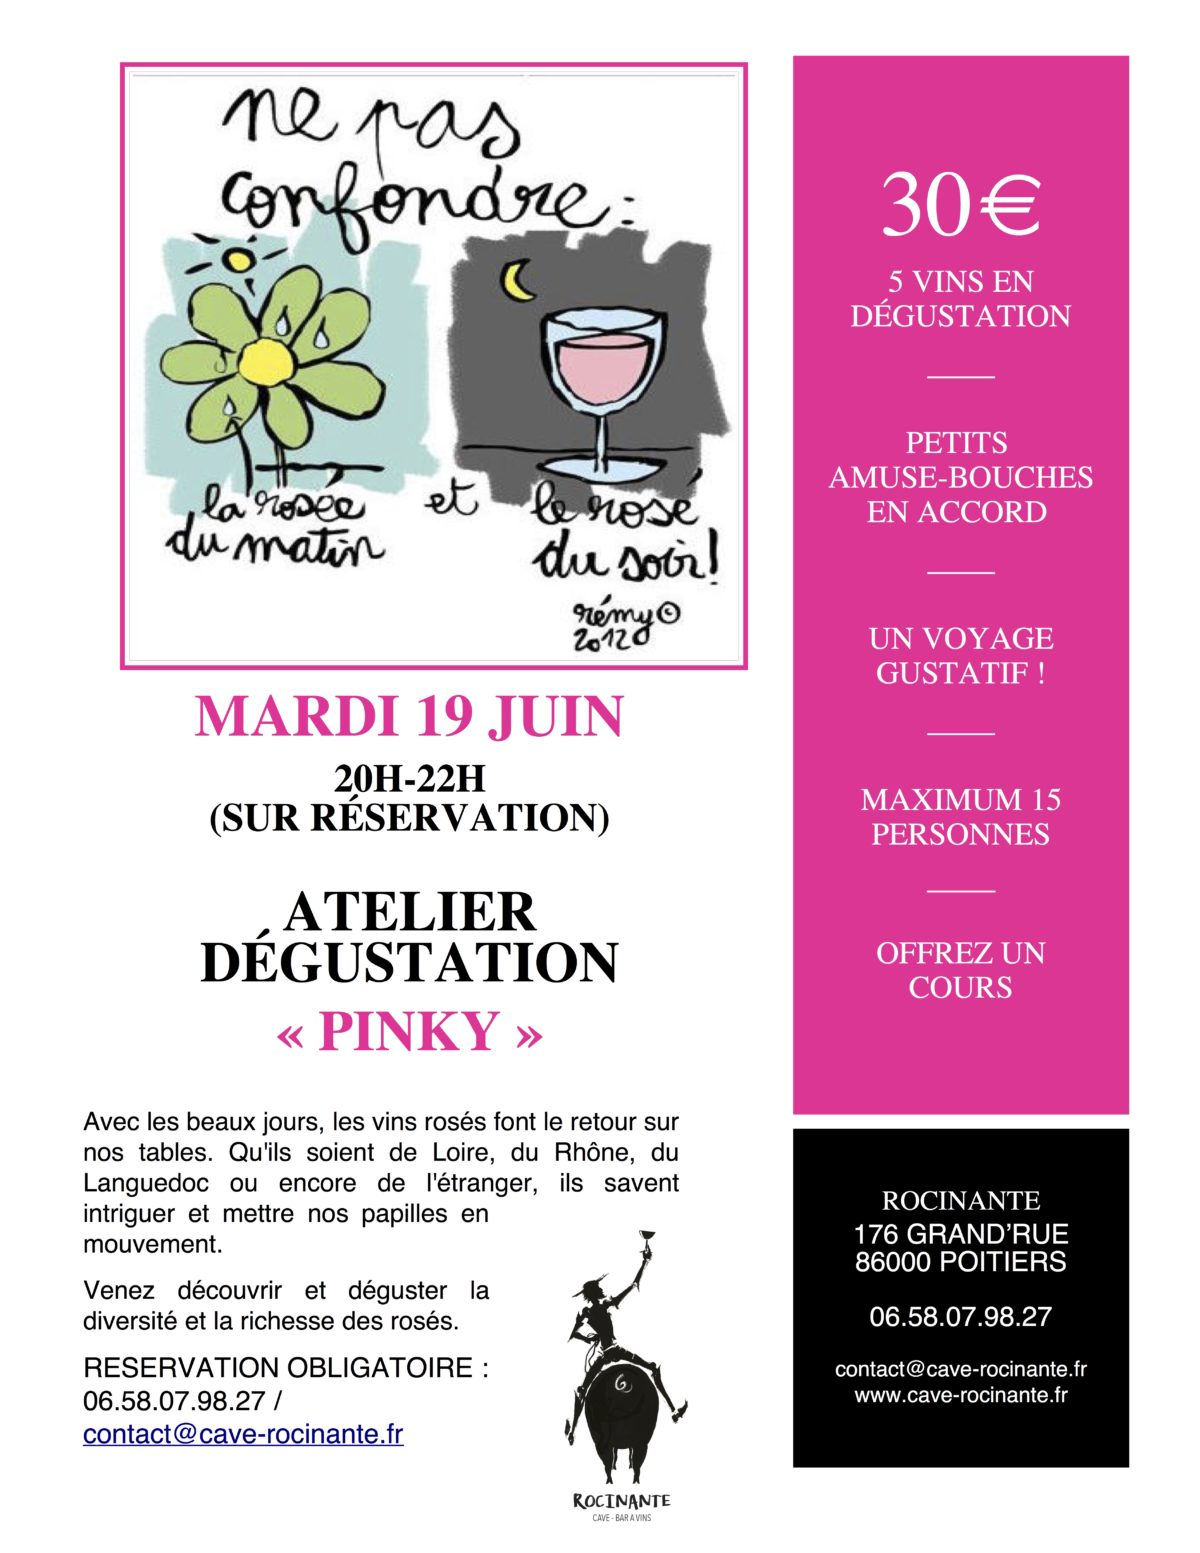 Atelier Dégustation «Pinky»